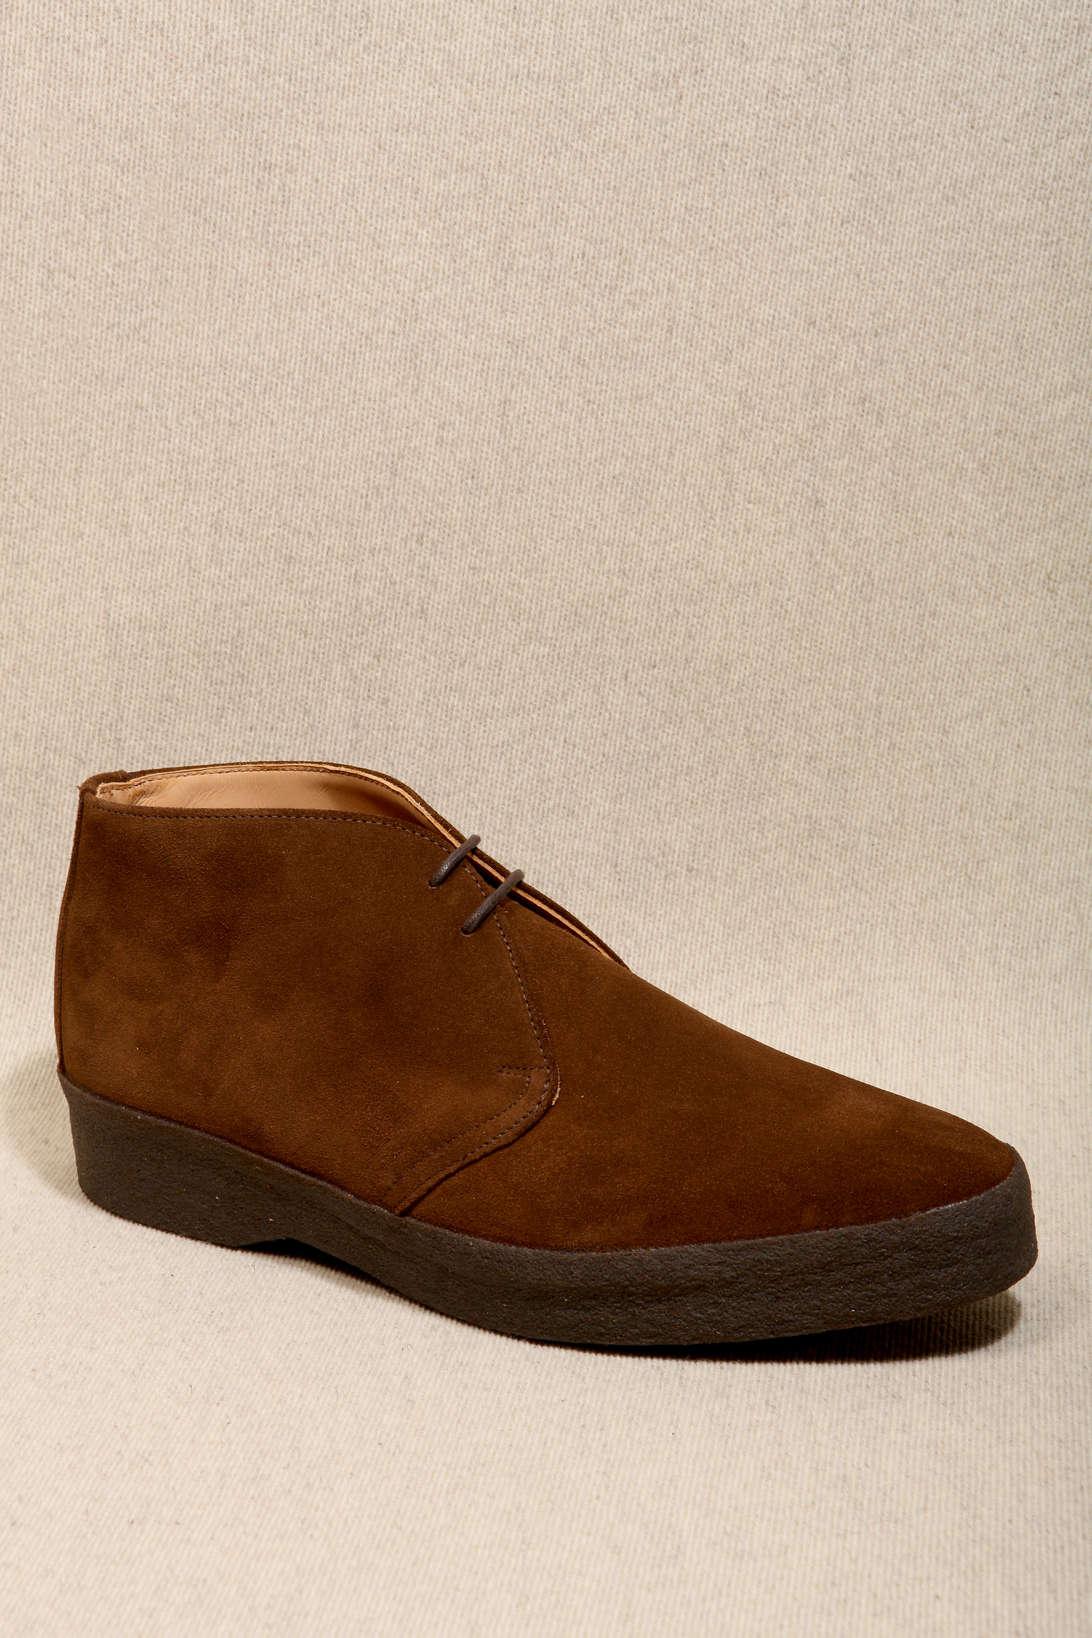 Sanders -playboy-boots-chukka-Steve-mcqueen-lecatalog.com